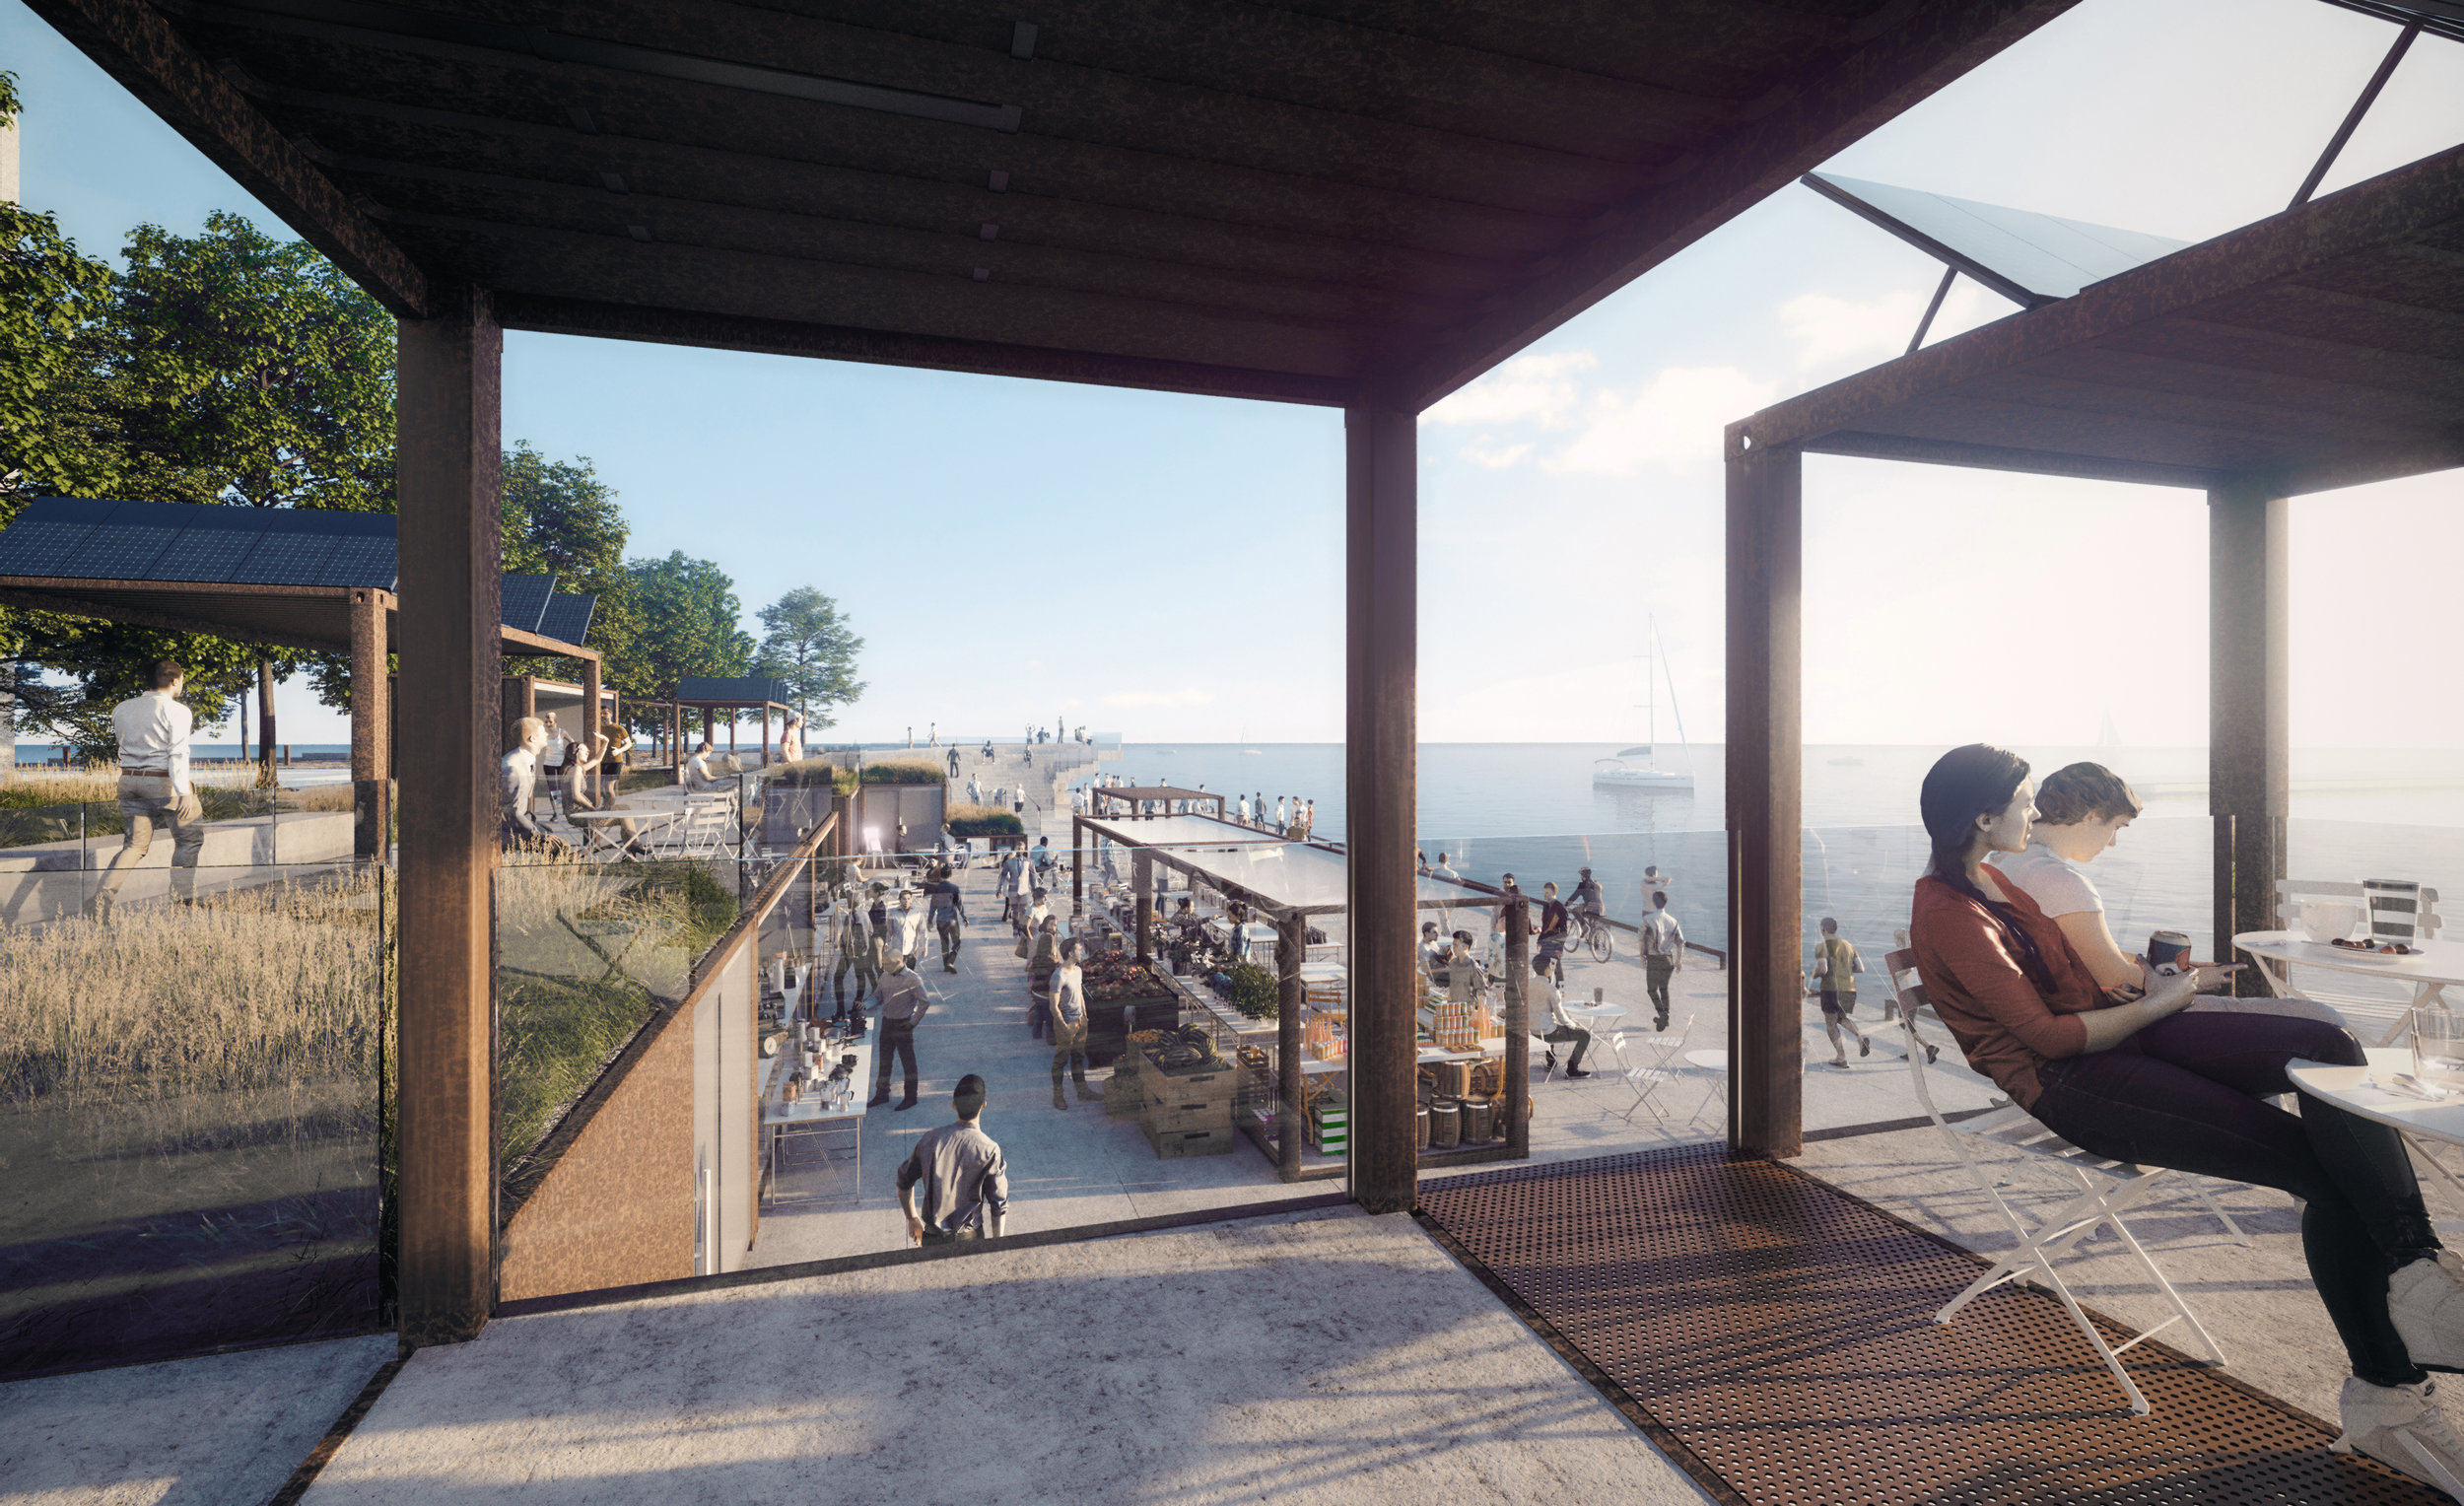 Pier 8 Promenade Park - Shipping Container Village Market